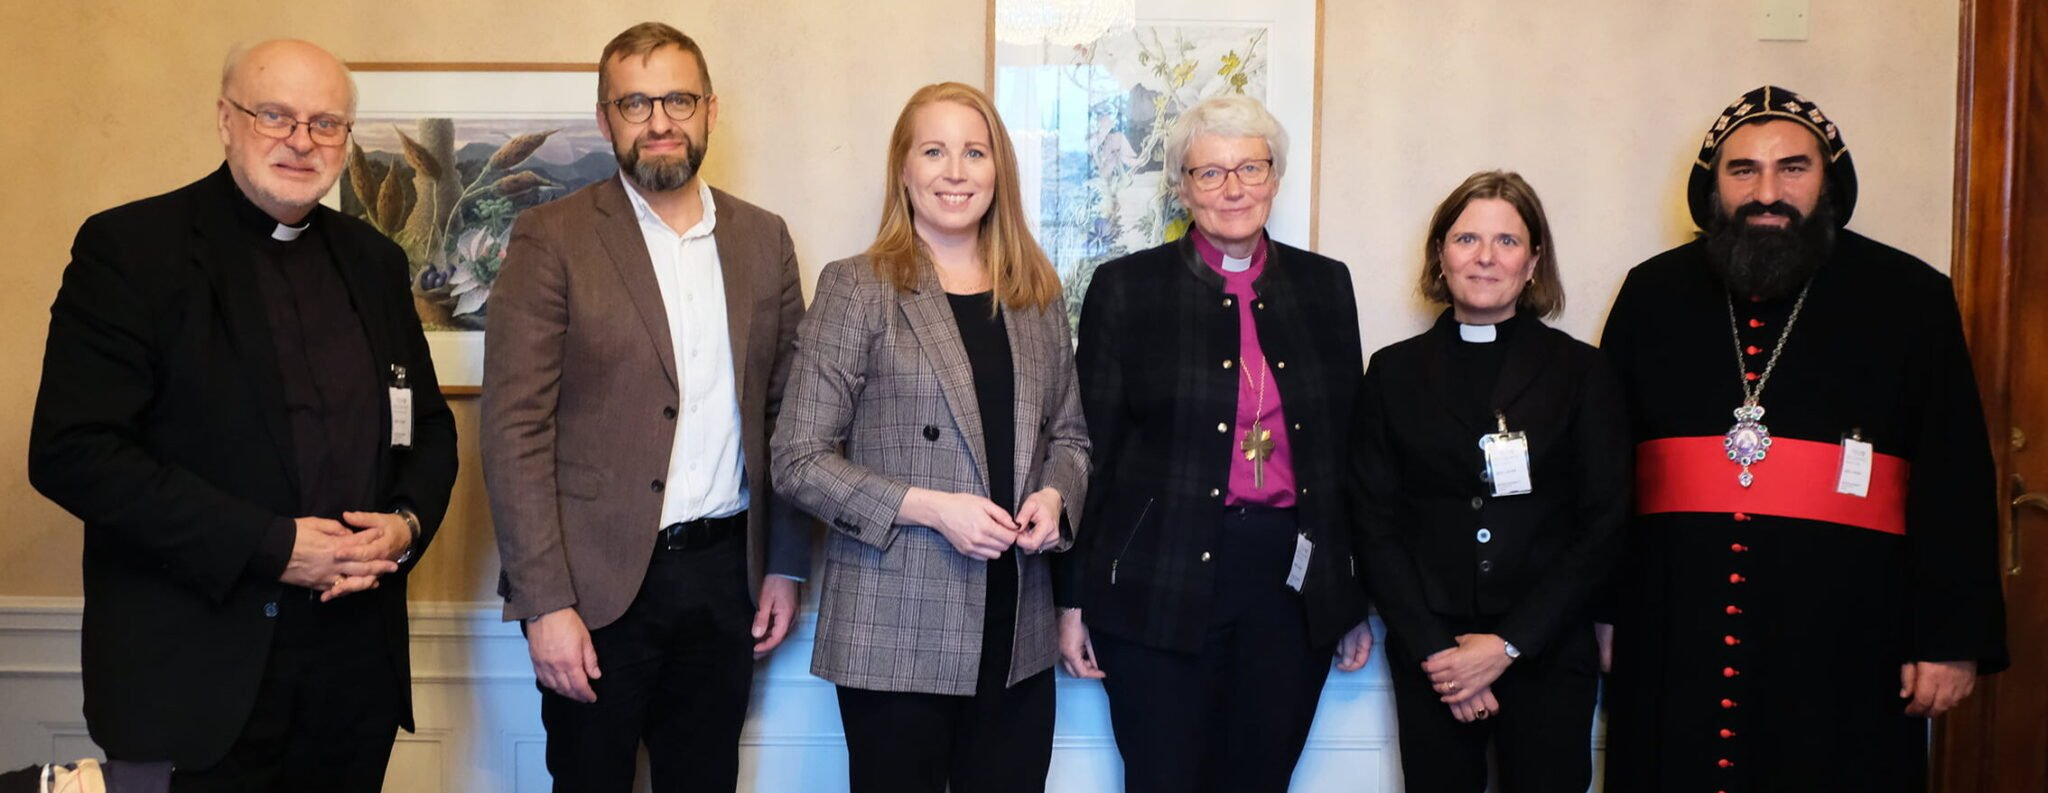 Sveriges kristna råds presidium och Annie Lööf Foto: Wilhelm Blixt